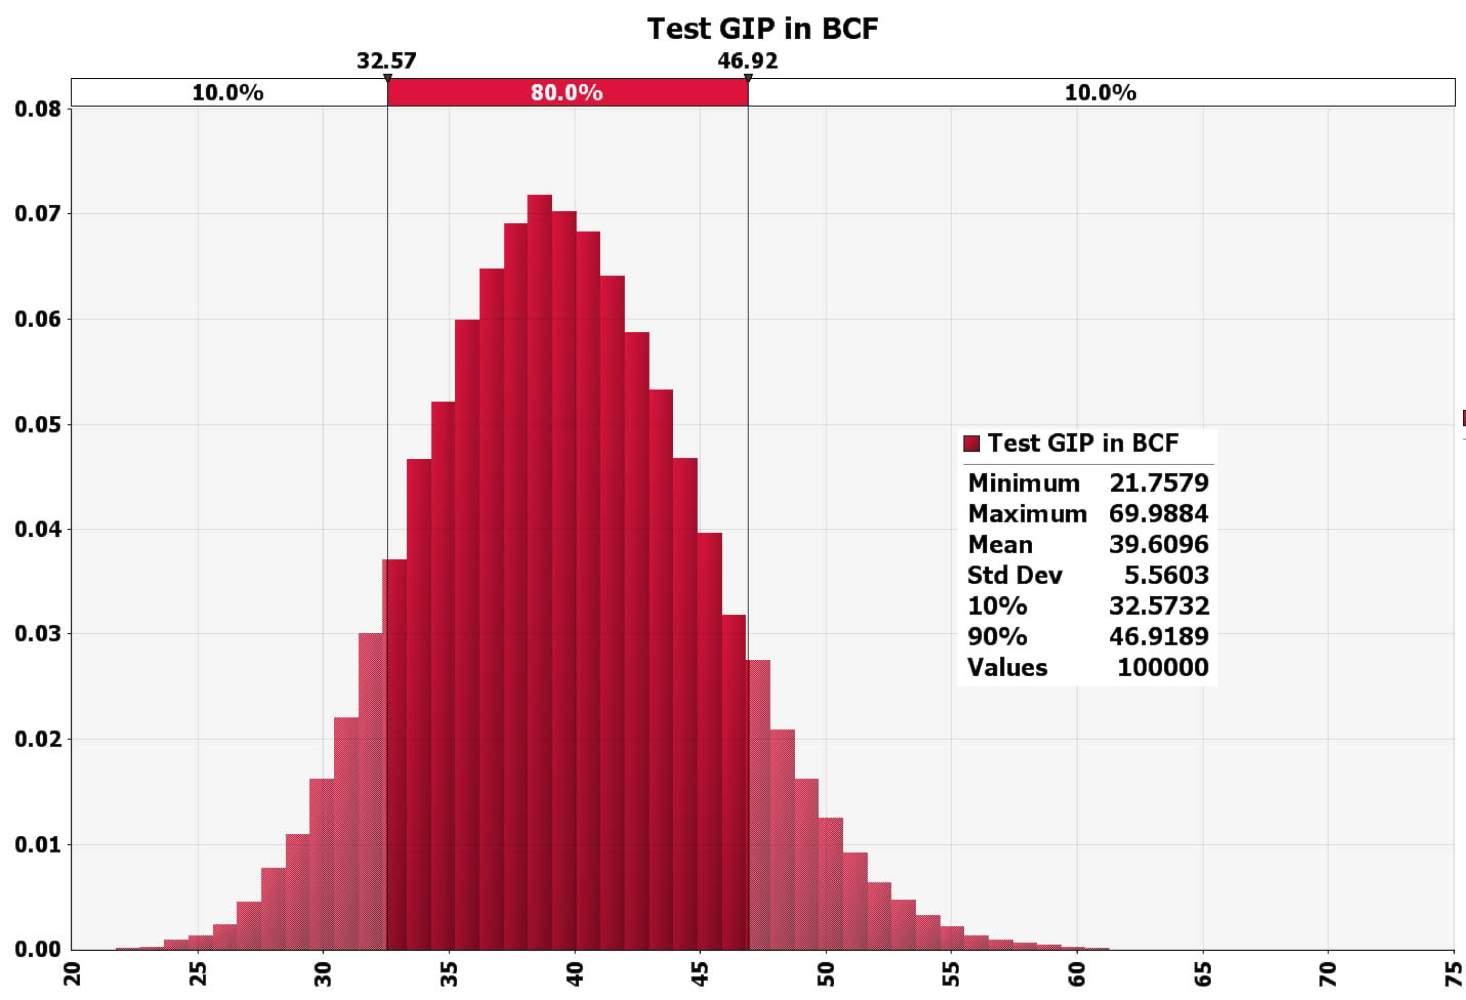 http://www.ciphercoal.com/ciphcms/wp-content/uploads/2013/03/test-distri2.png